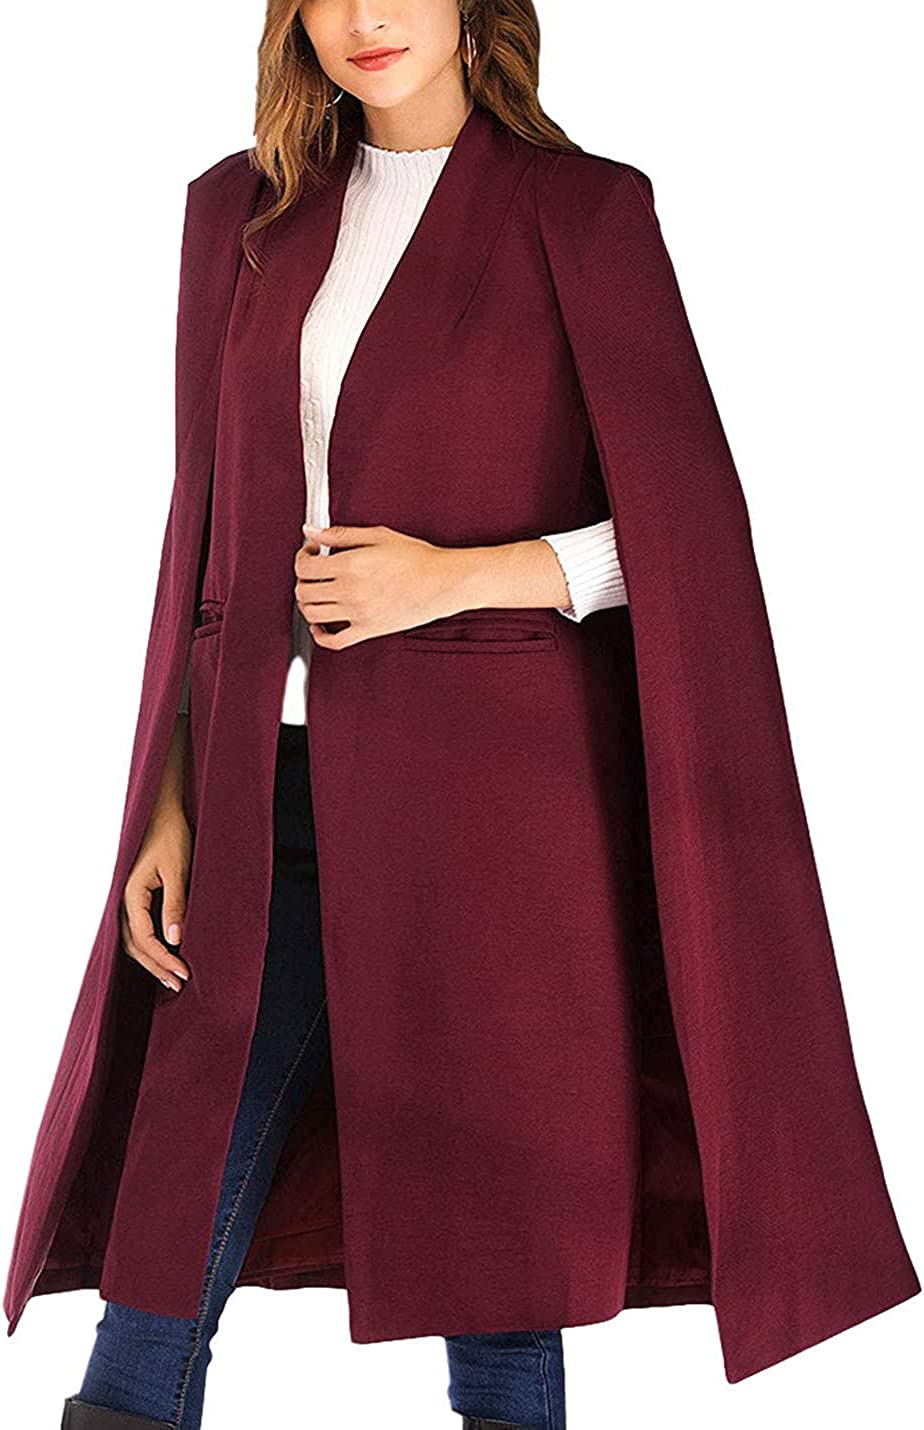 PAODIKUAI Women's Casual Solid Open Cape Cloak Sp trend rank gift Front Longline